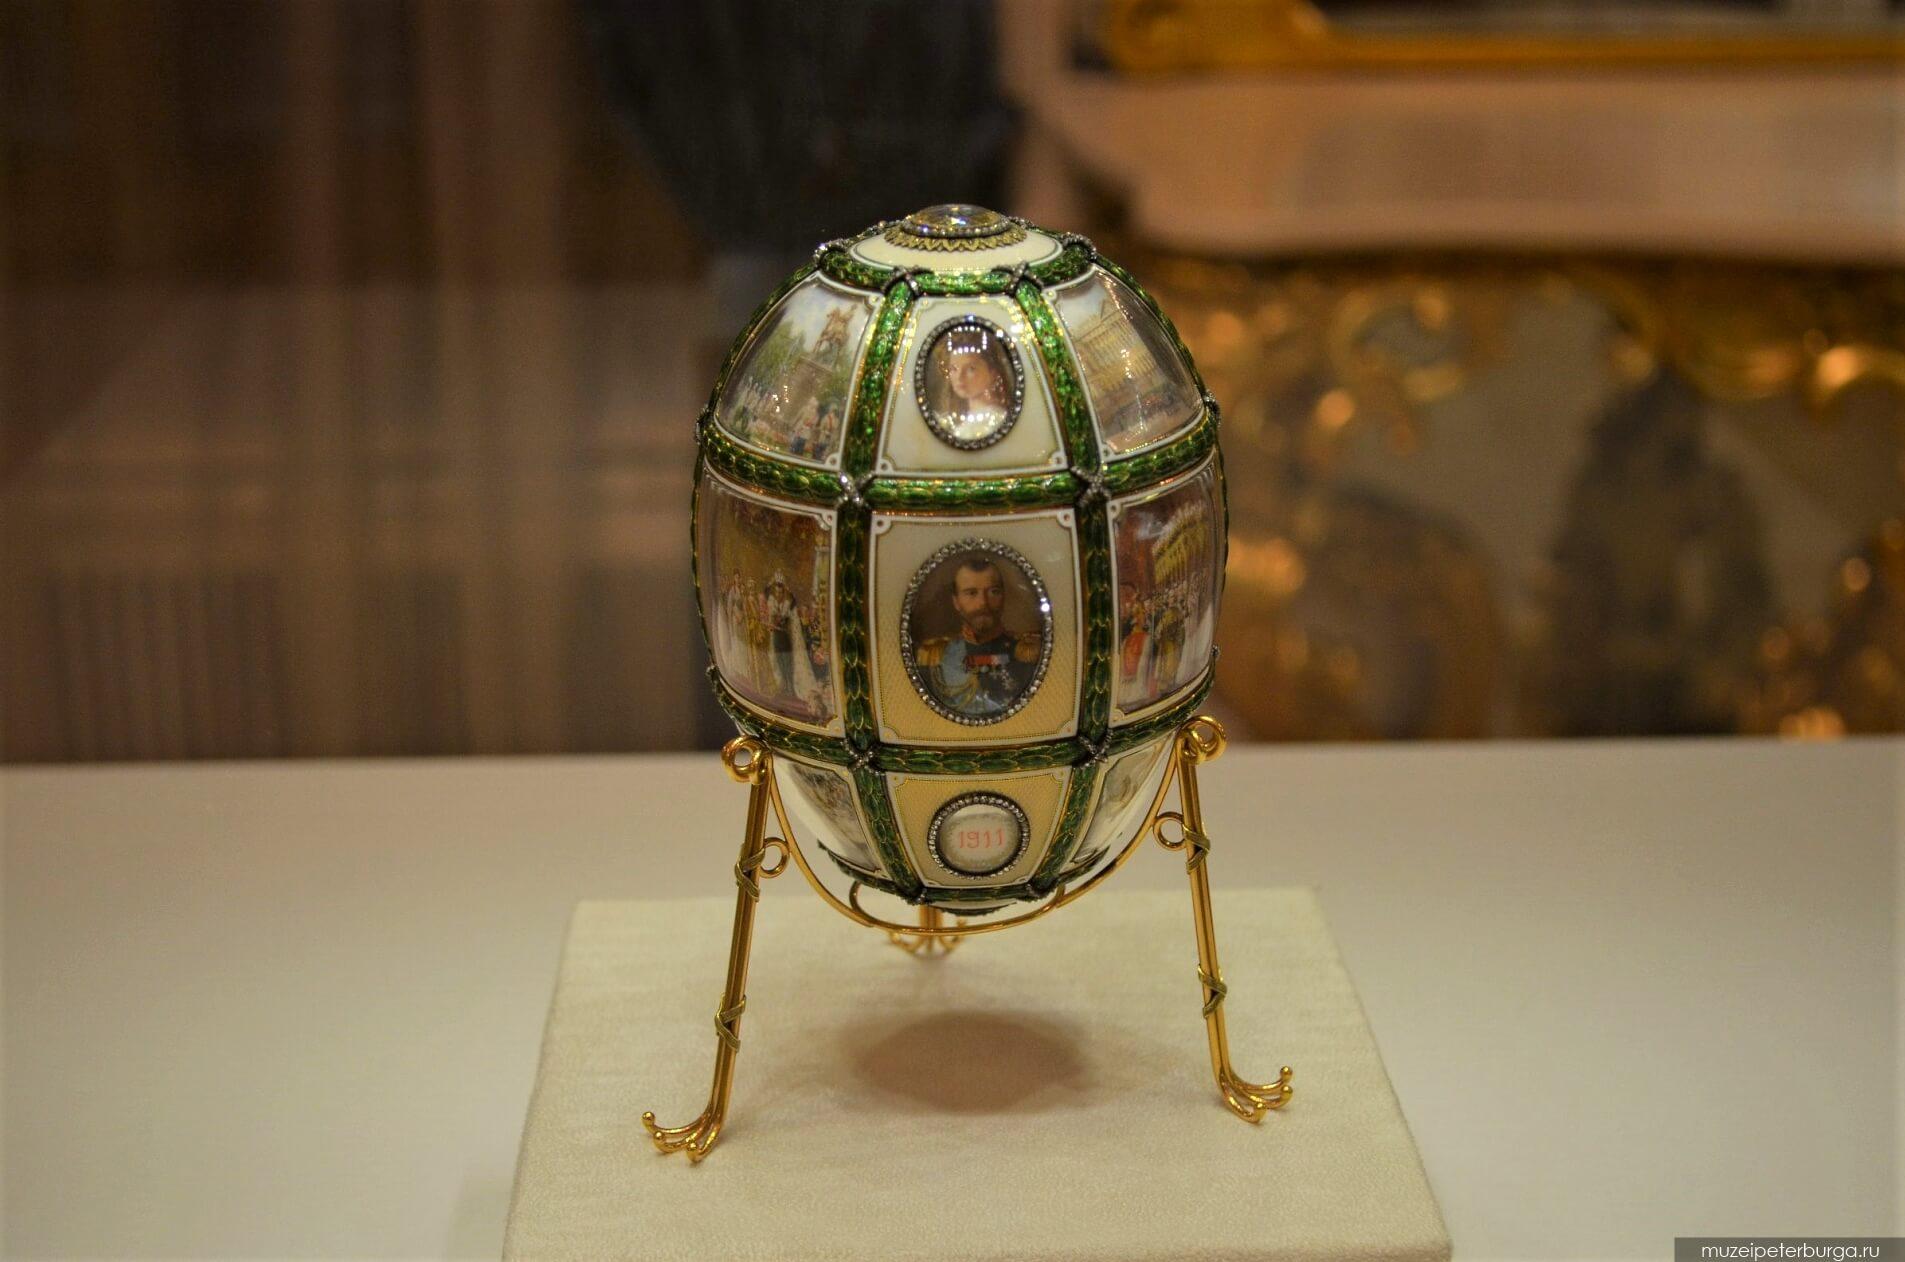 Яйцо «Пятнадцатилетие царствования»